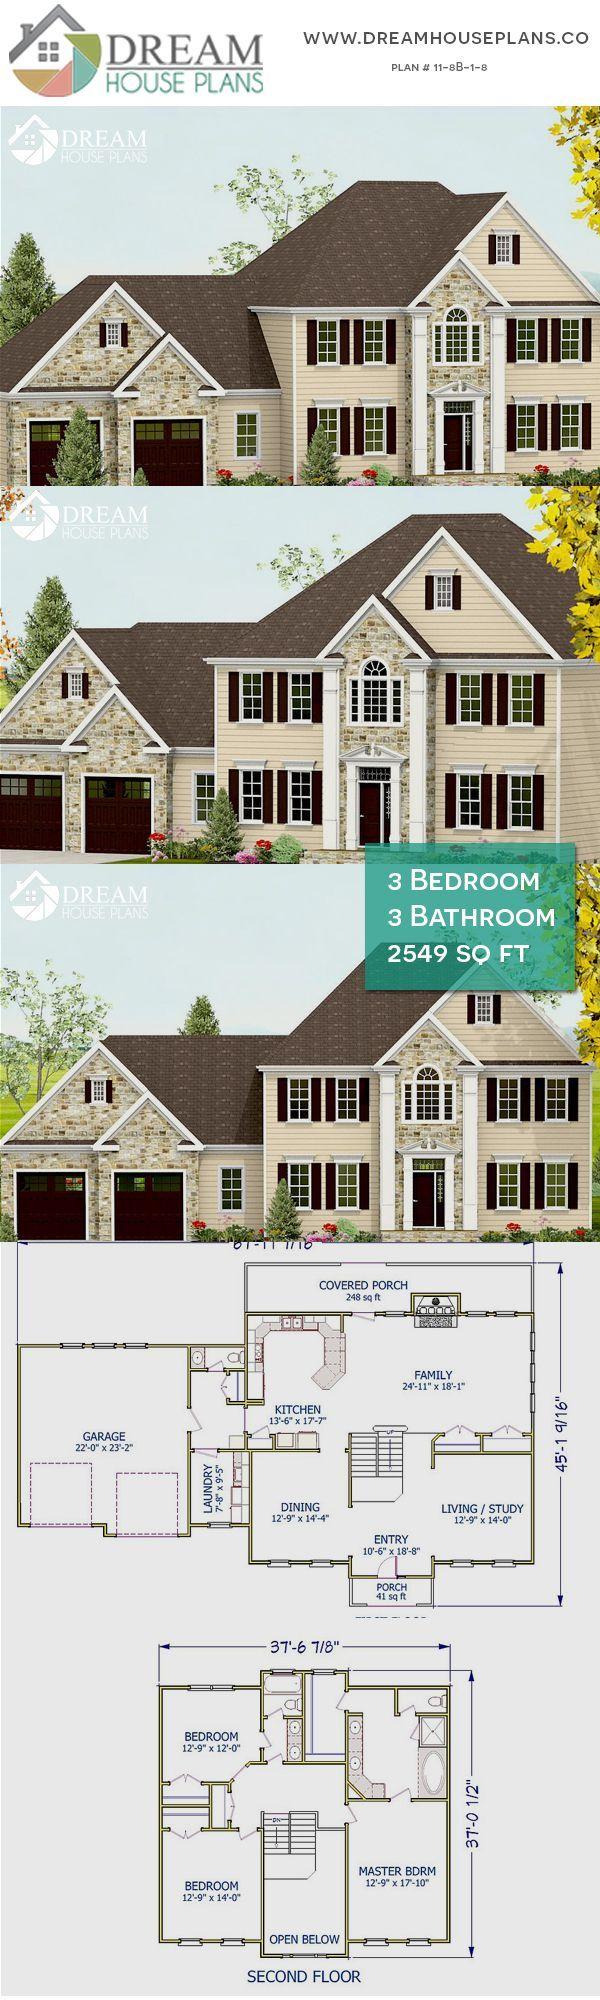 3 Bedroom 3 Bathroom 2549 Sq Ft 11 8b 1 8 Traditional House Plans 118b18 Bathroom B Traditional House Plans Porch House Plans Dream House Plans